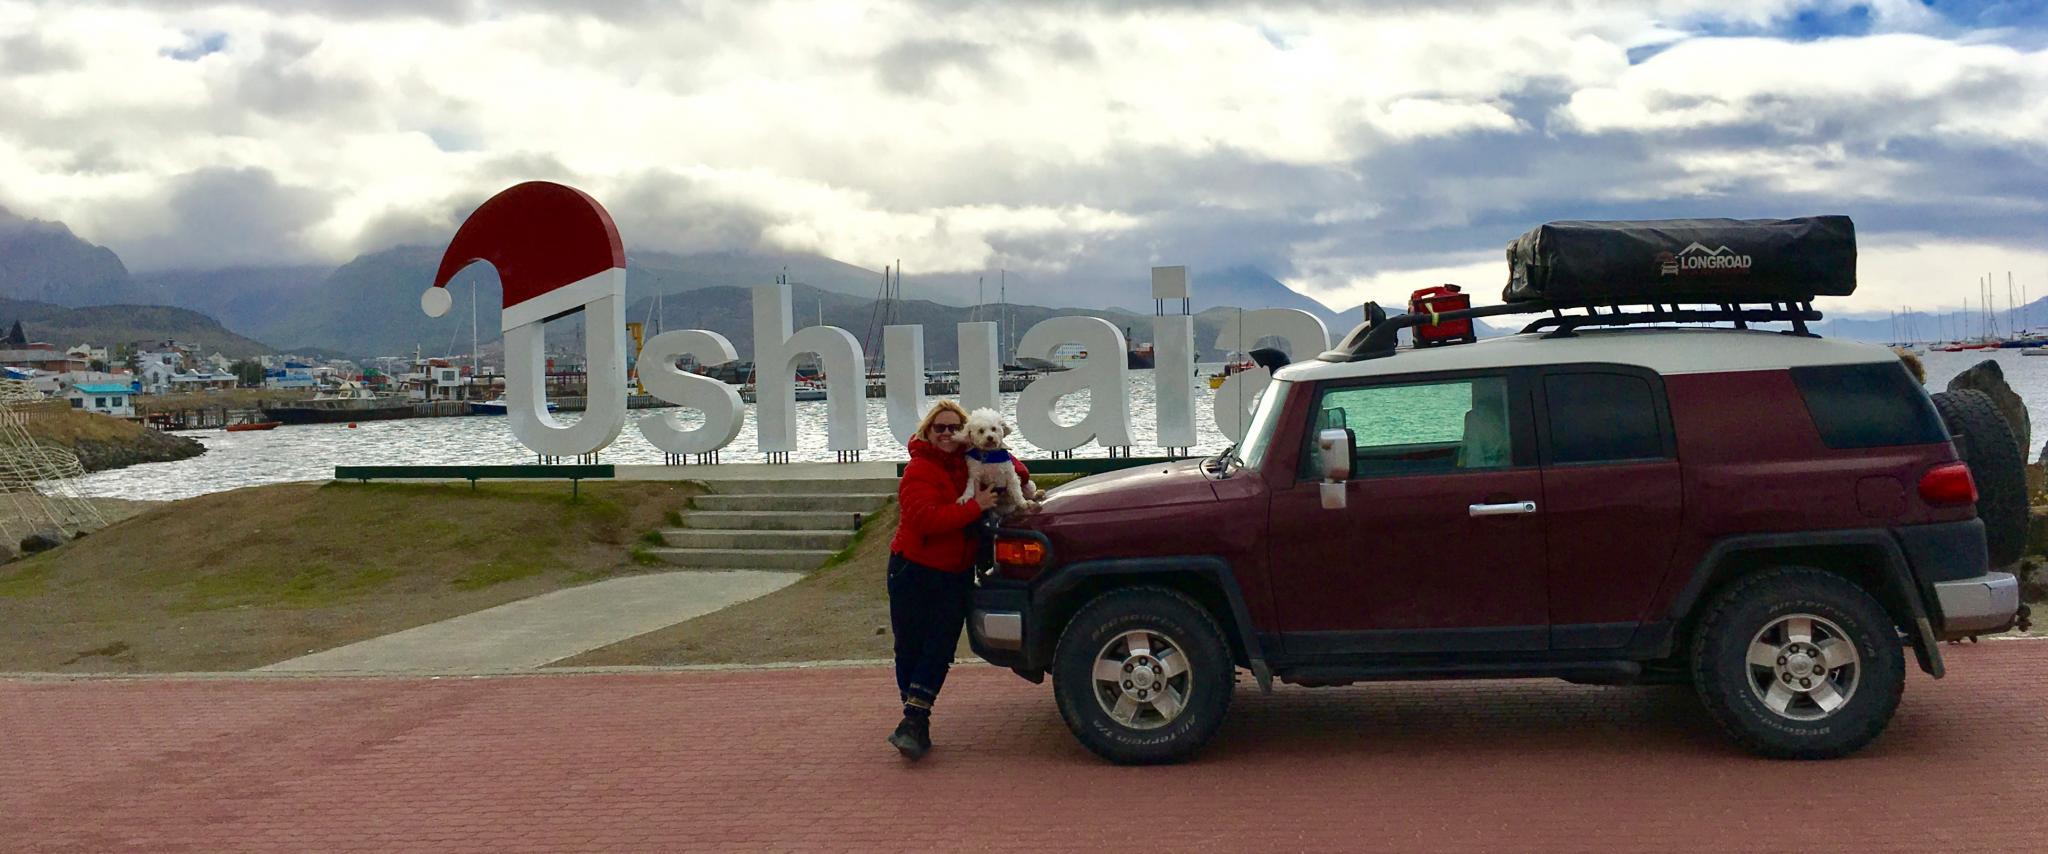 Ushuaia or Bust!-749b91db-42bc-4404-849d-a0a29fca70d5_1547541837361.jpeg